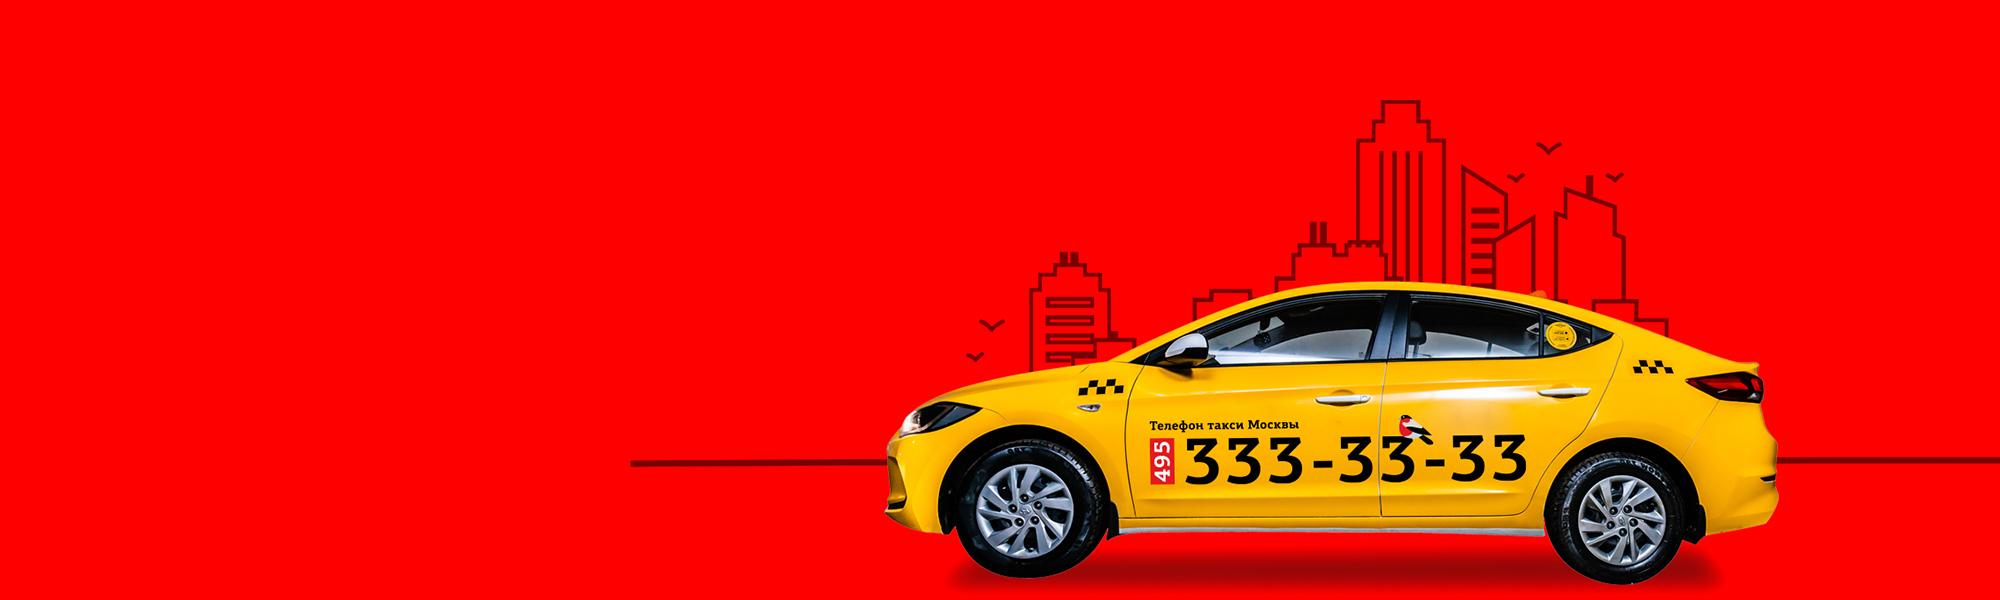 гетт служба поддержки телефон москва для водителей